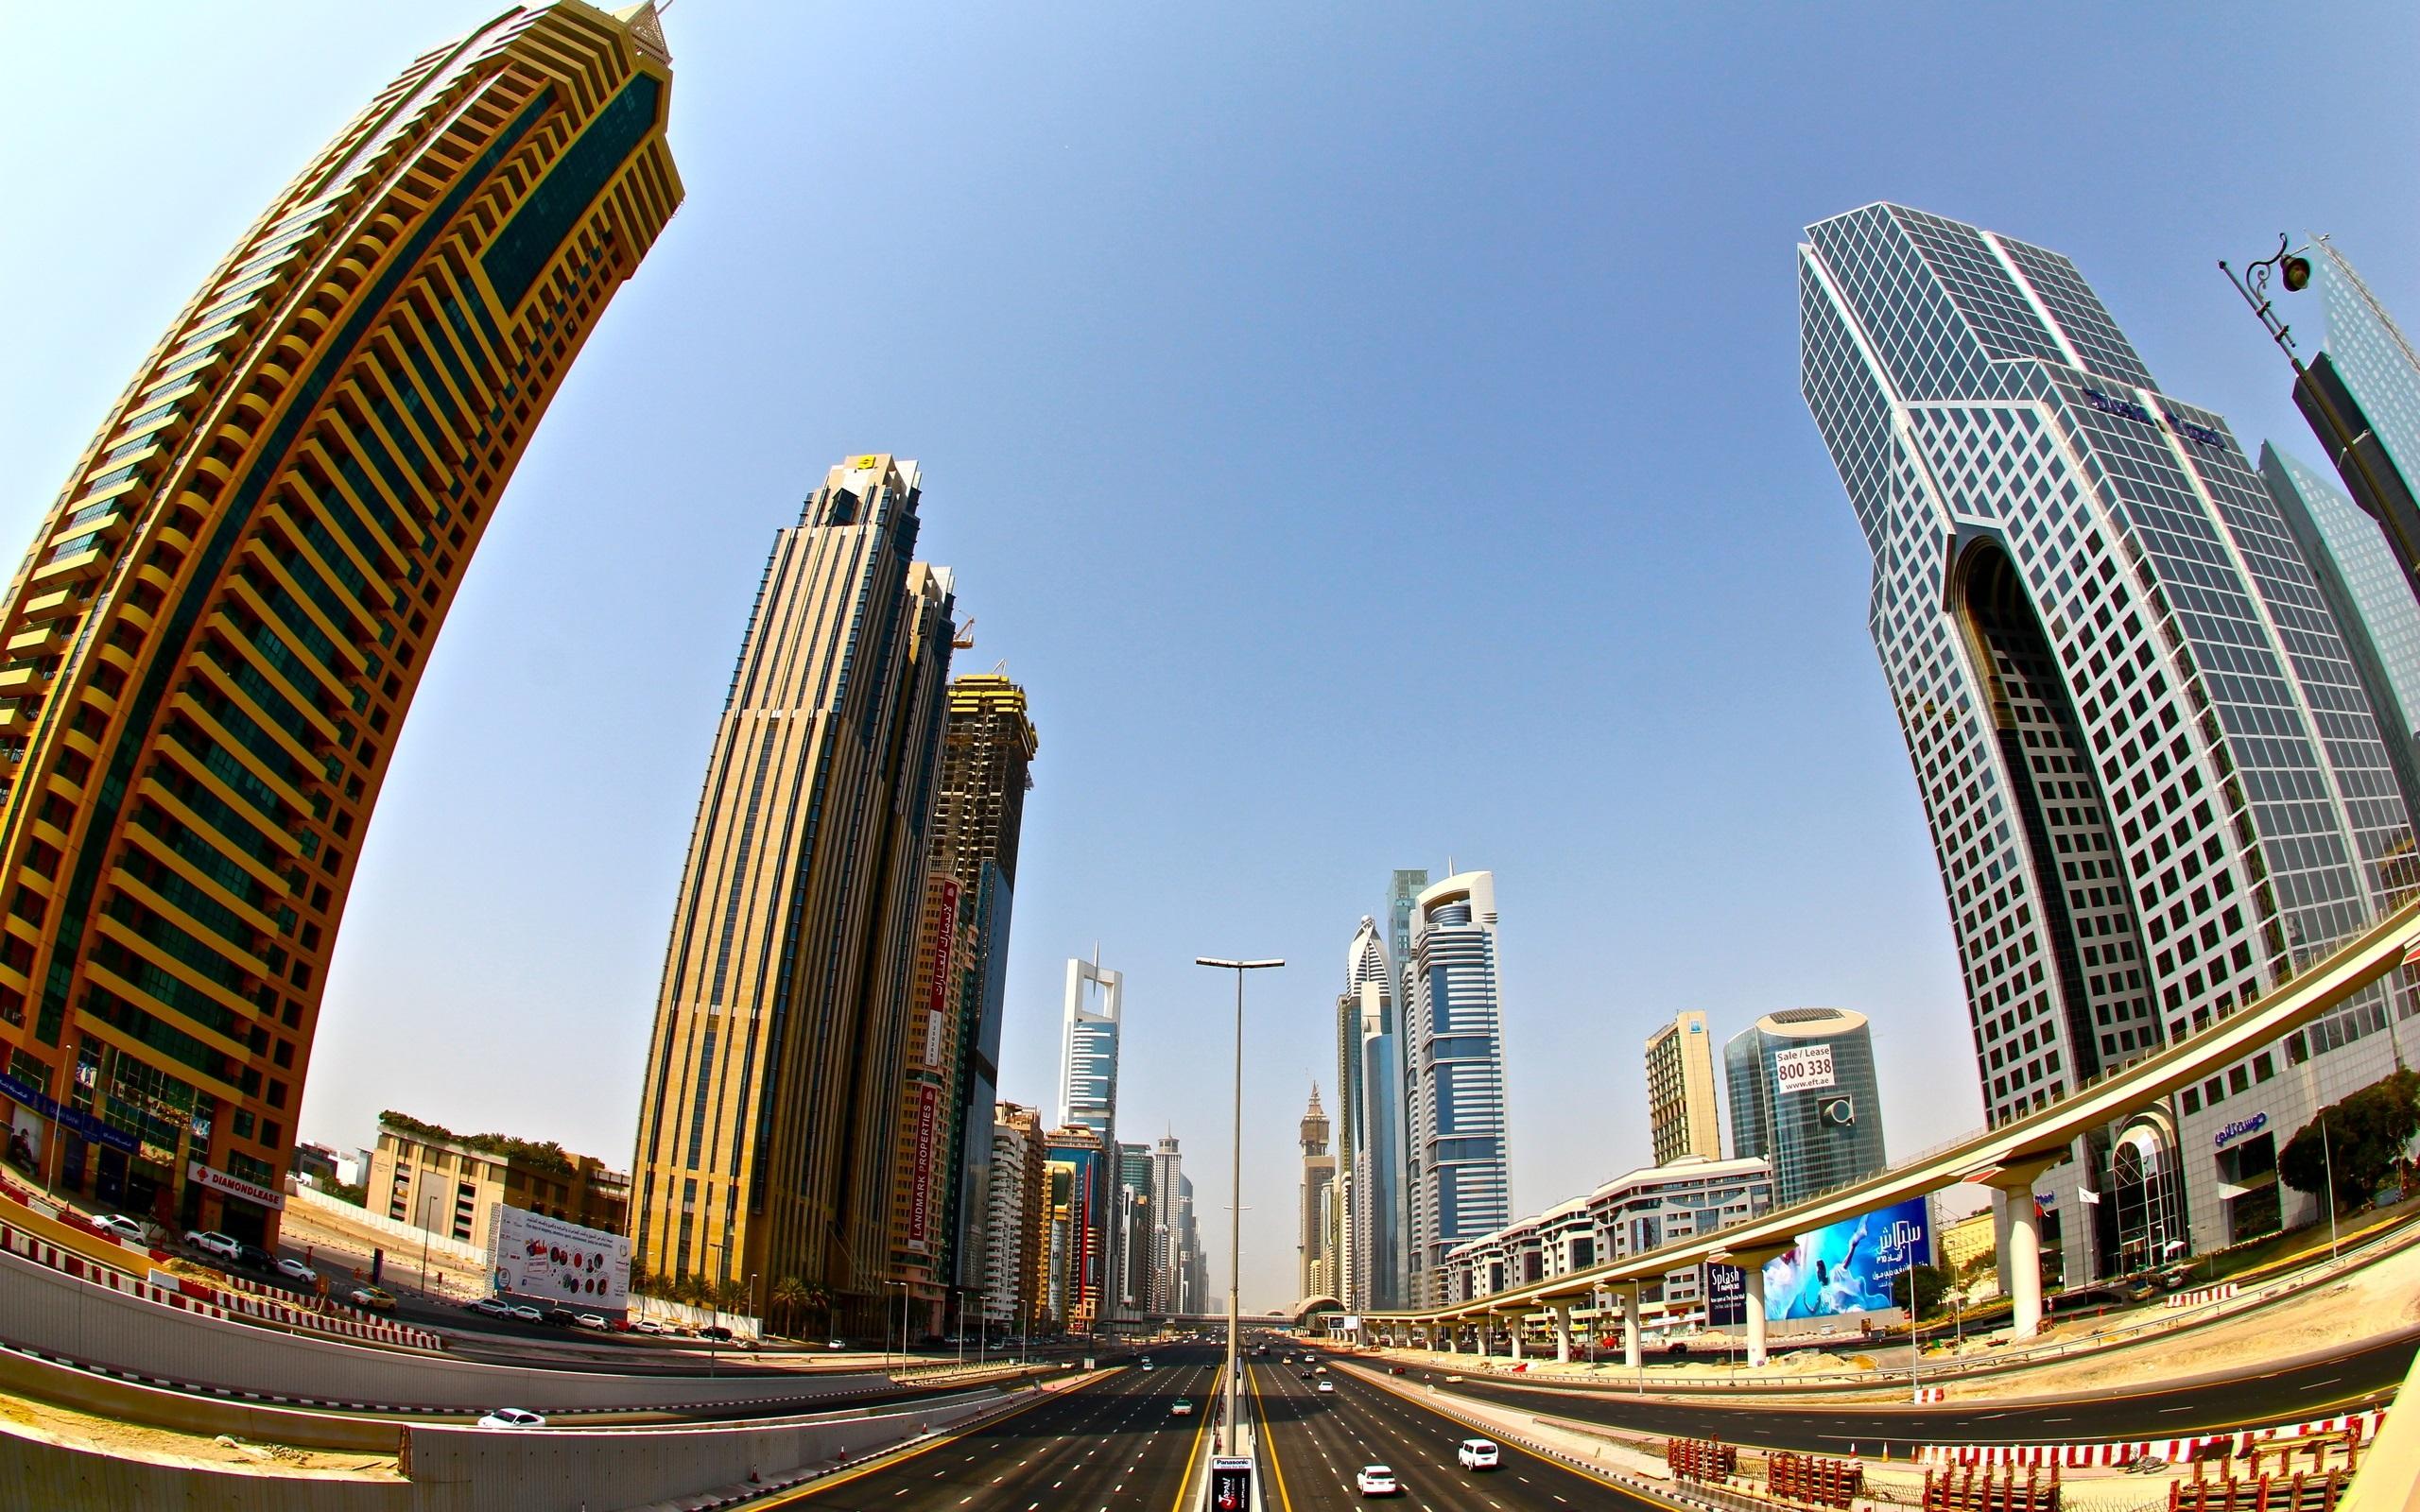 Fondos De Pantalla Dubai, Rascacielos, Carretera, Ciudad